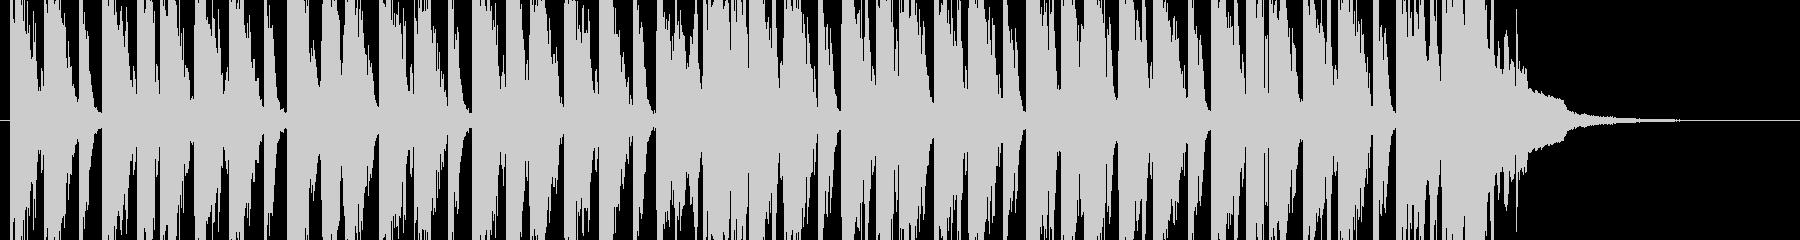 Electro-Dubstepイン...の未再生の波形